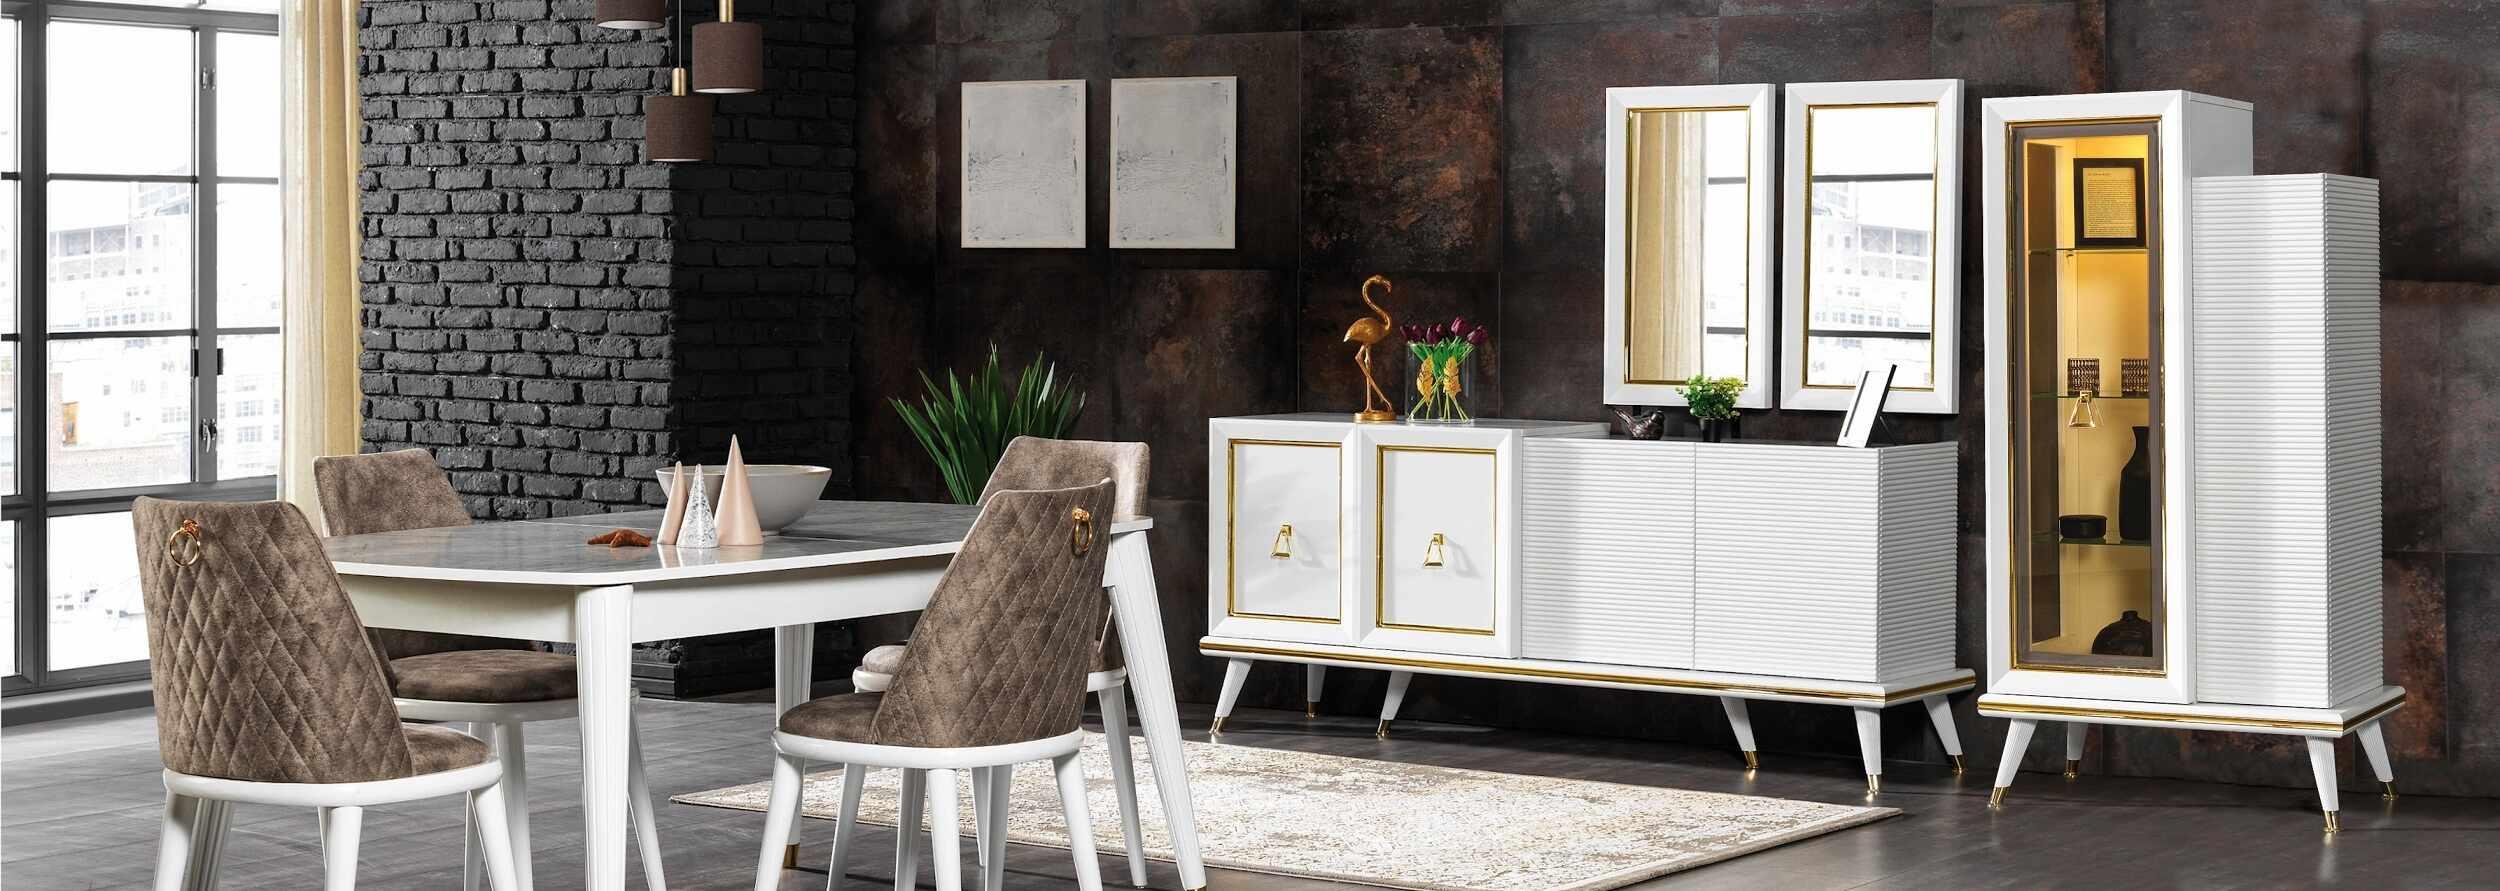 Set de mobila dining din pal si metal, 11 piese Toscana Alb / Auriu la pret 10732 lei